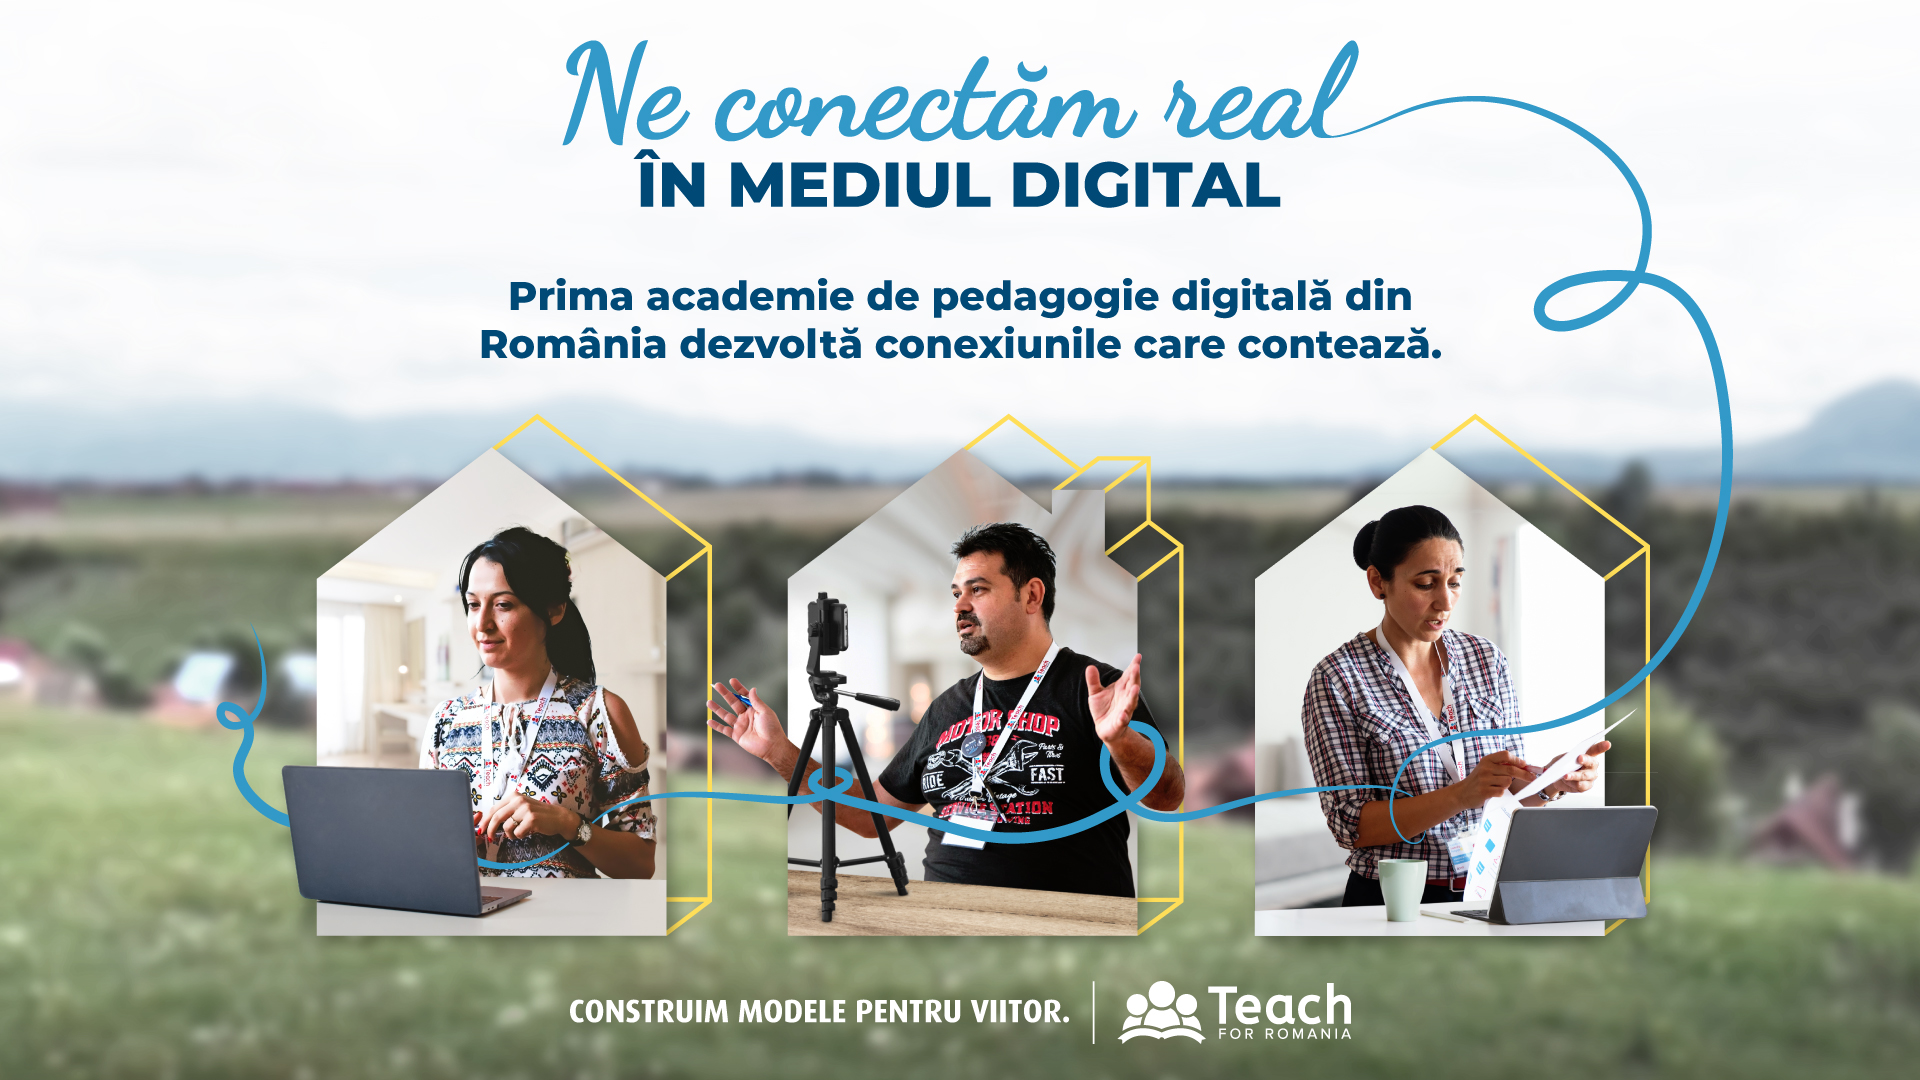 Teach for Romania / Academia de Leadership și Pedagogie Digitală 2020